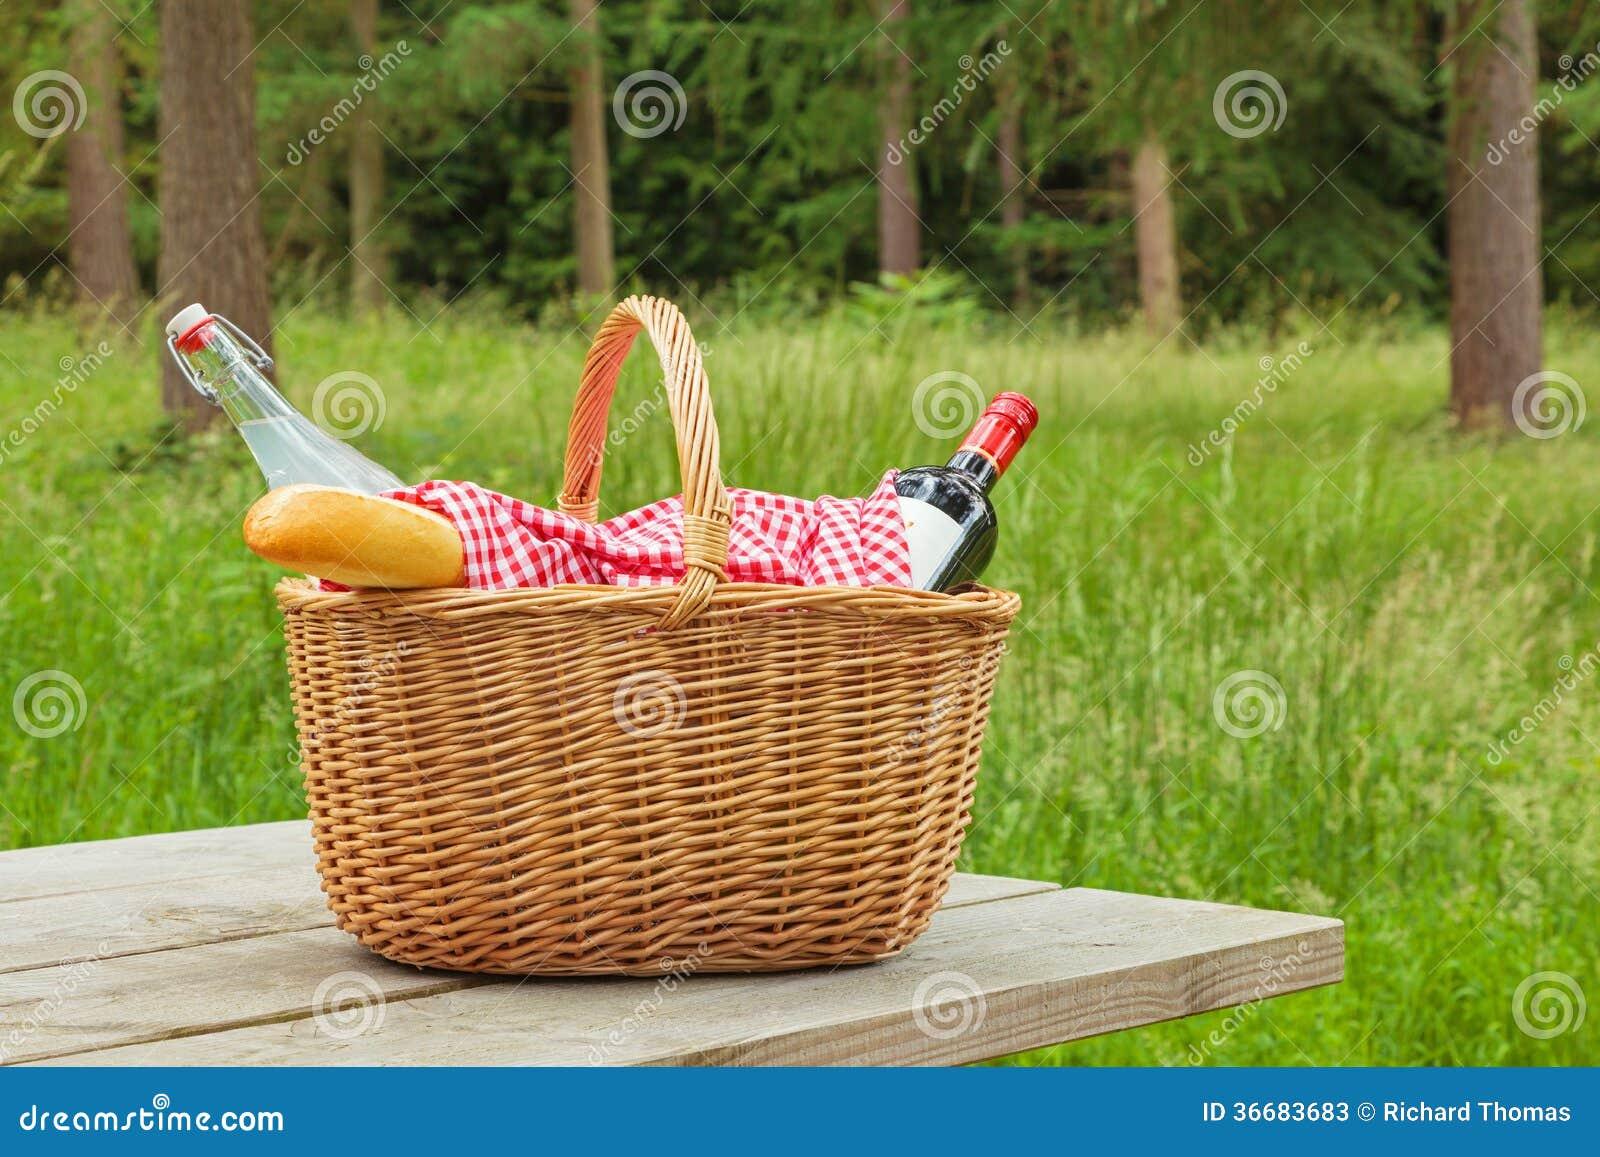 Picnic Basket Food : Picnic basket in a woodland setting stock photos image